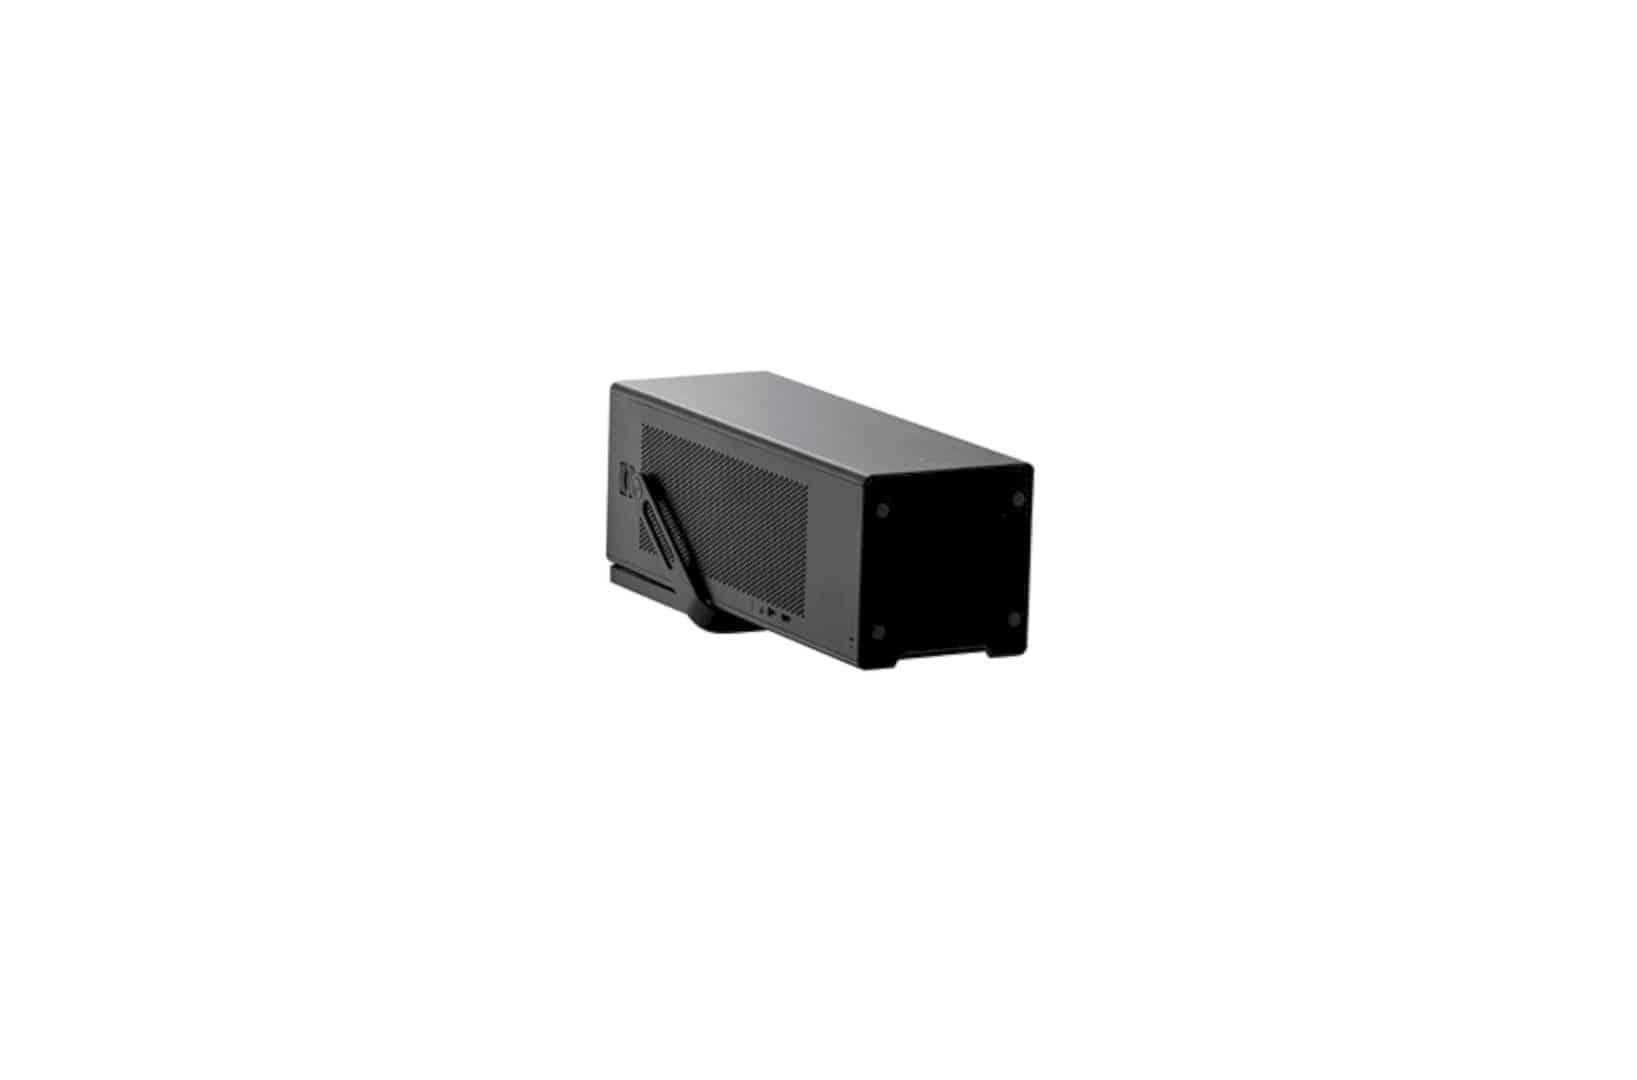 LG HU80KA Projector 1